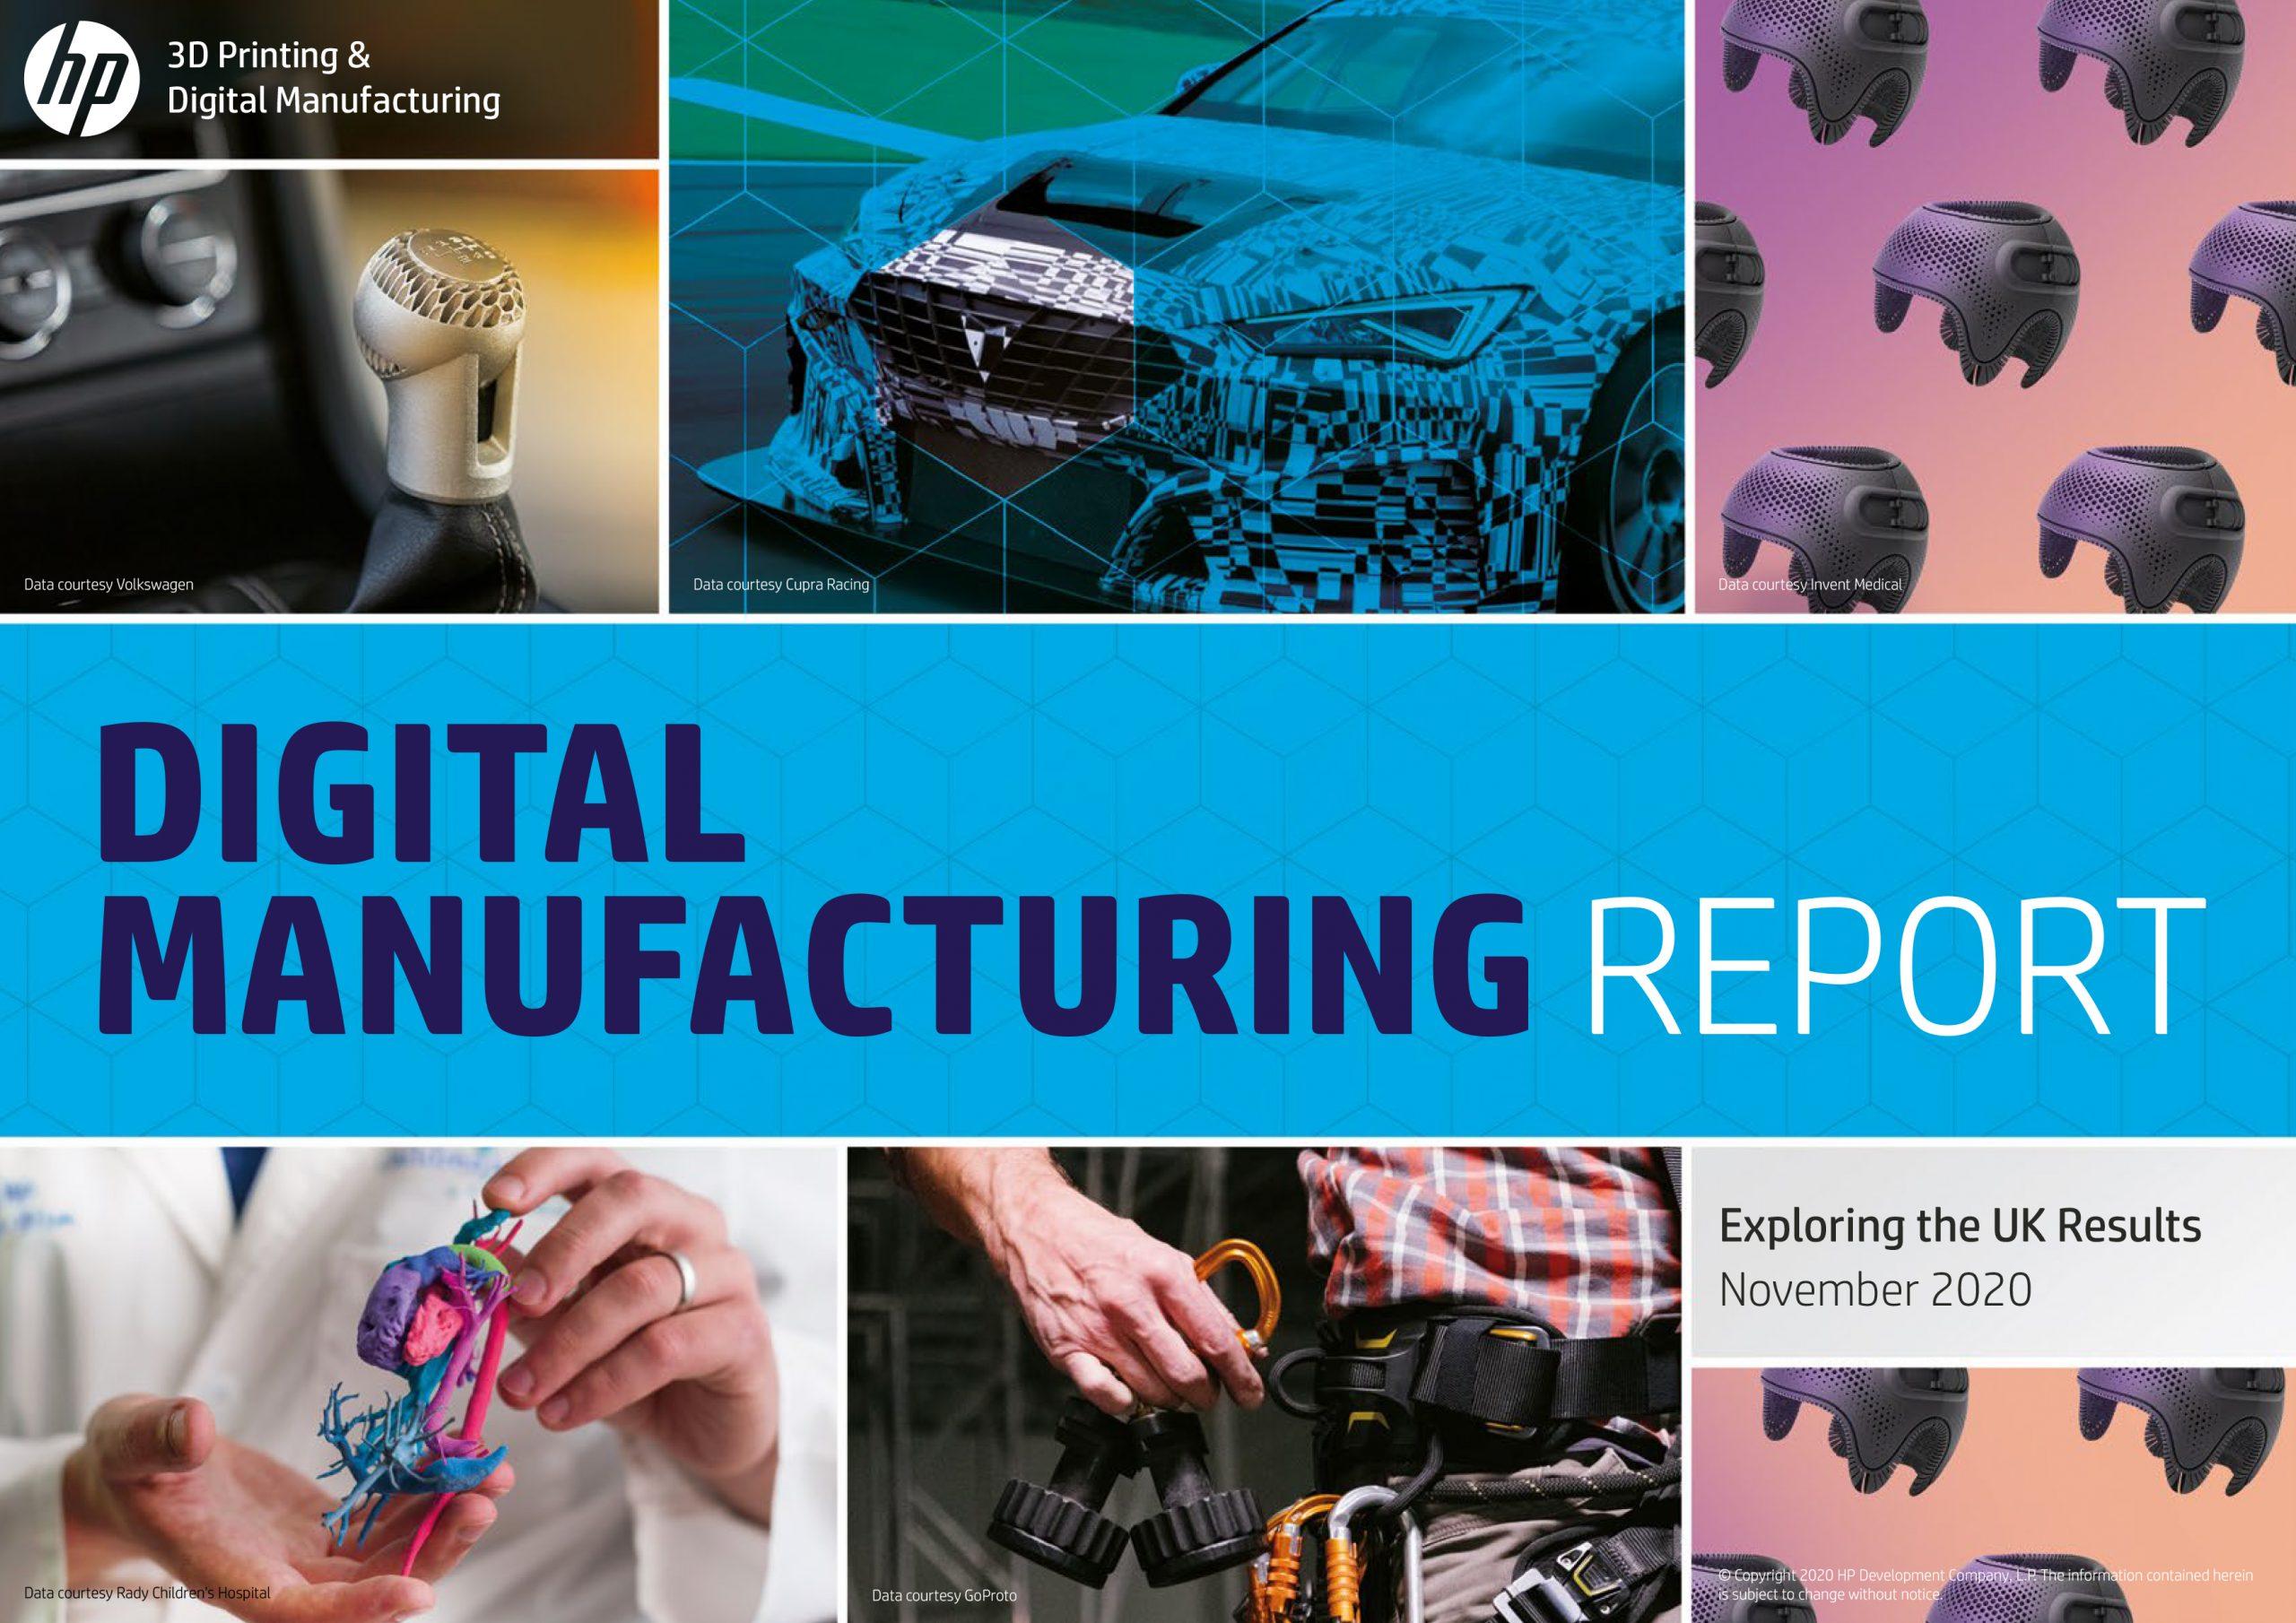 HP Digital Manufacturing Trends Report